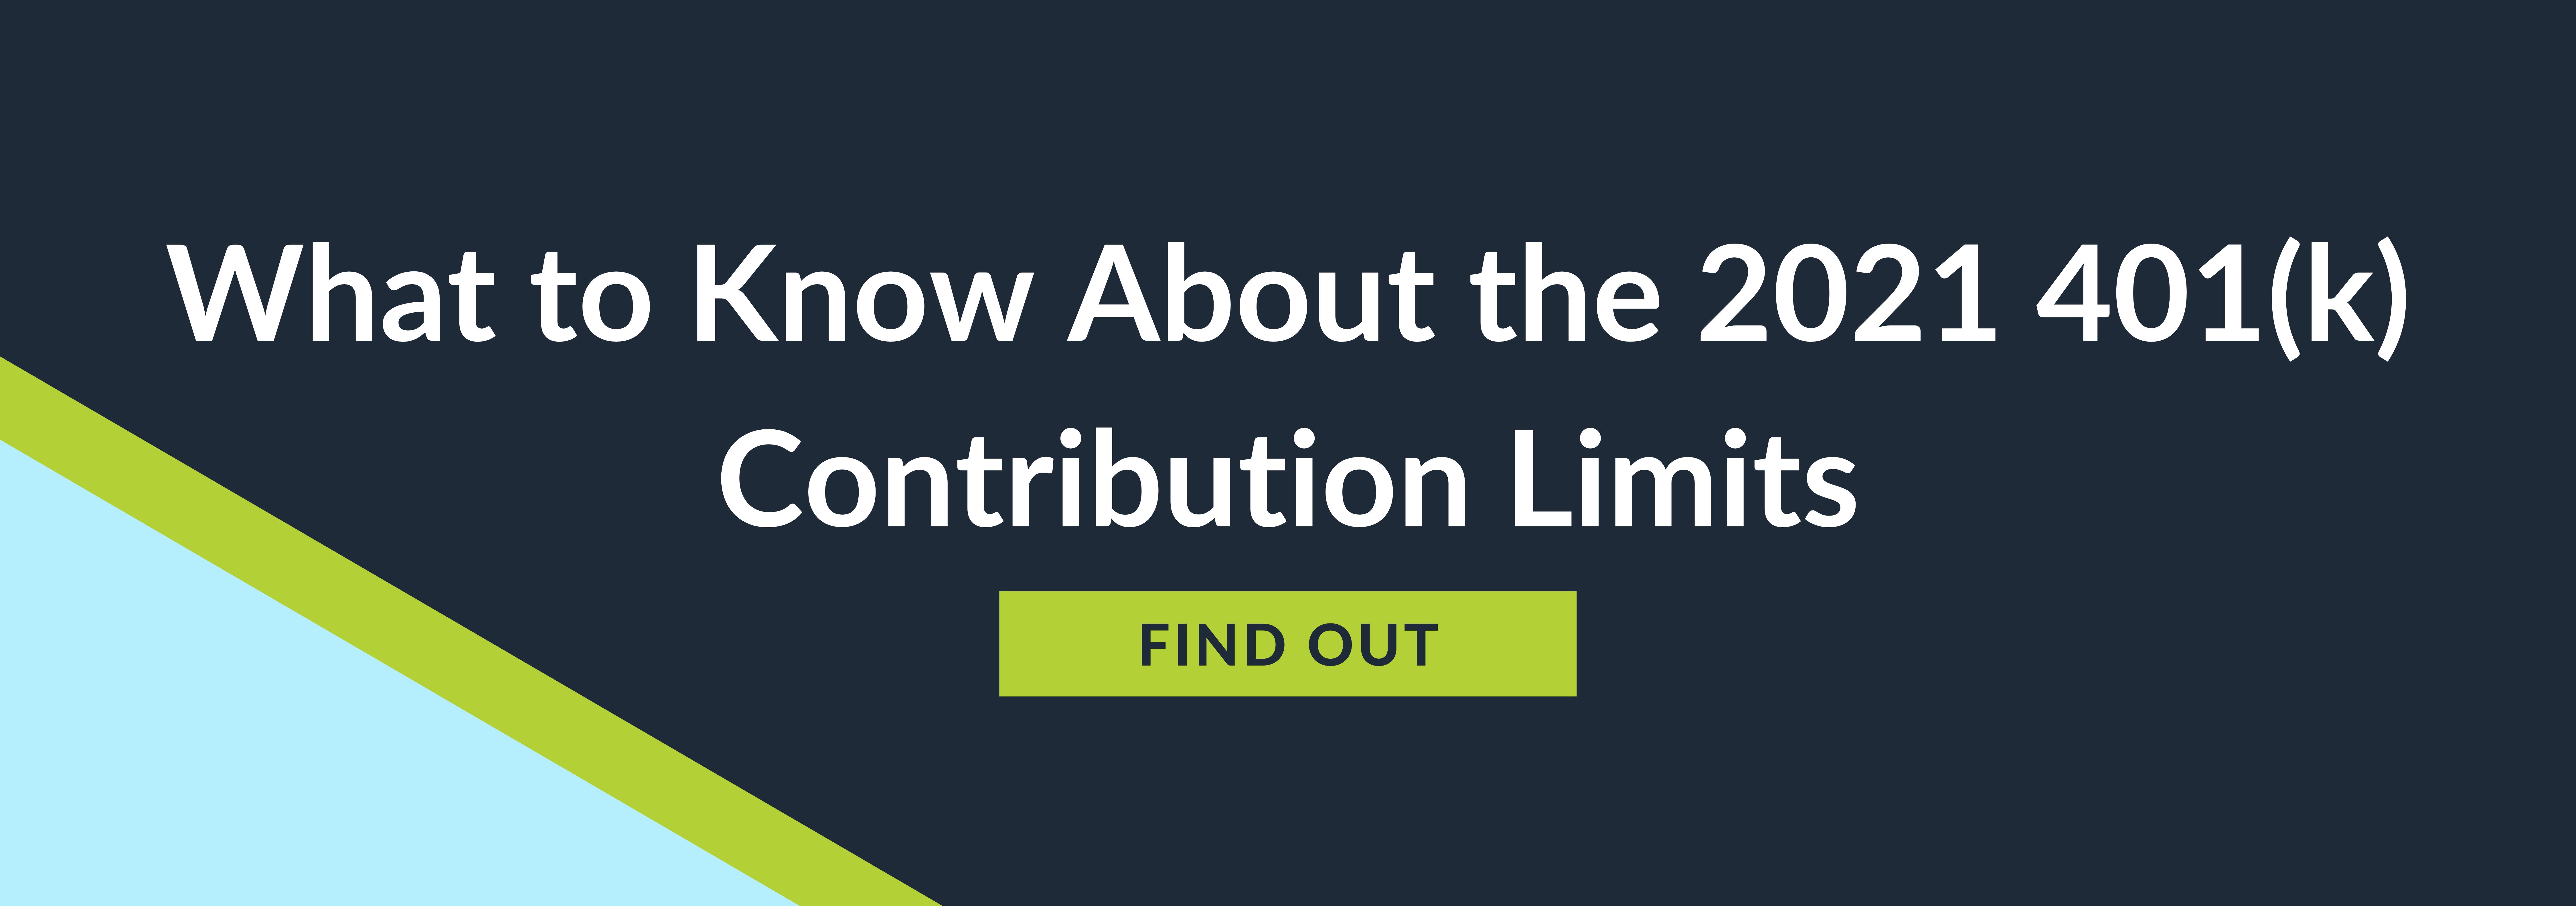 2021 401(k) Contribution Limits